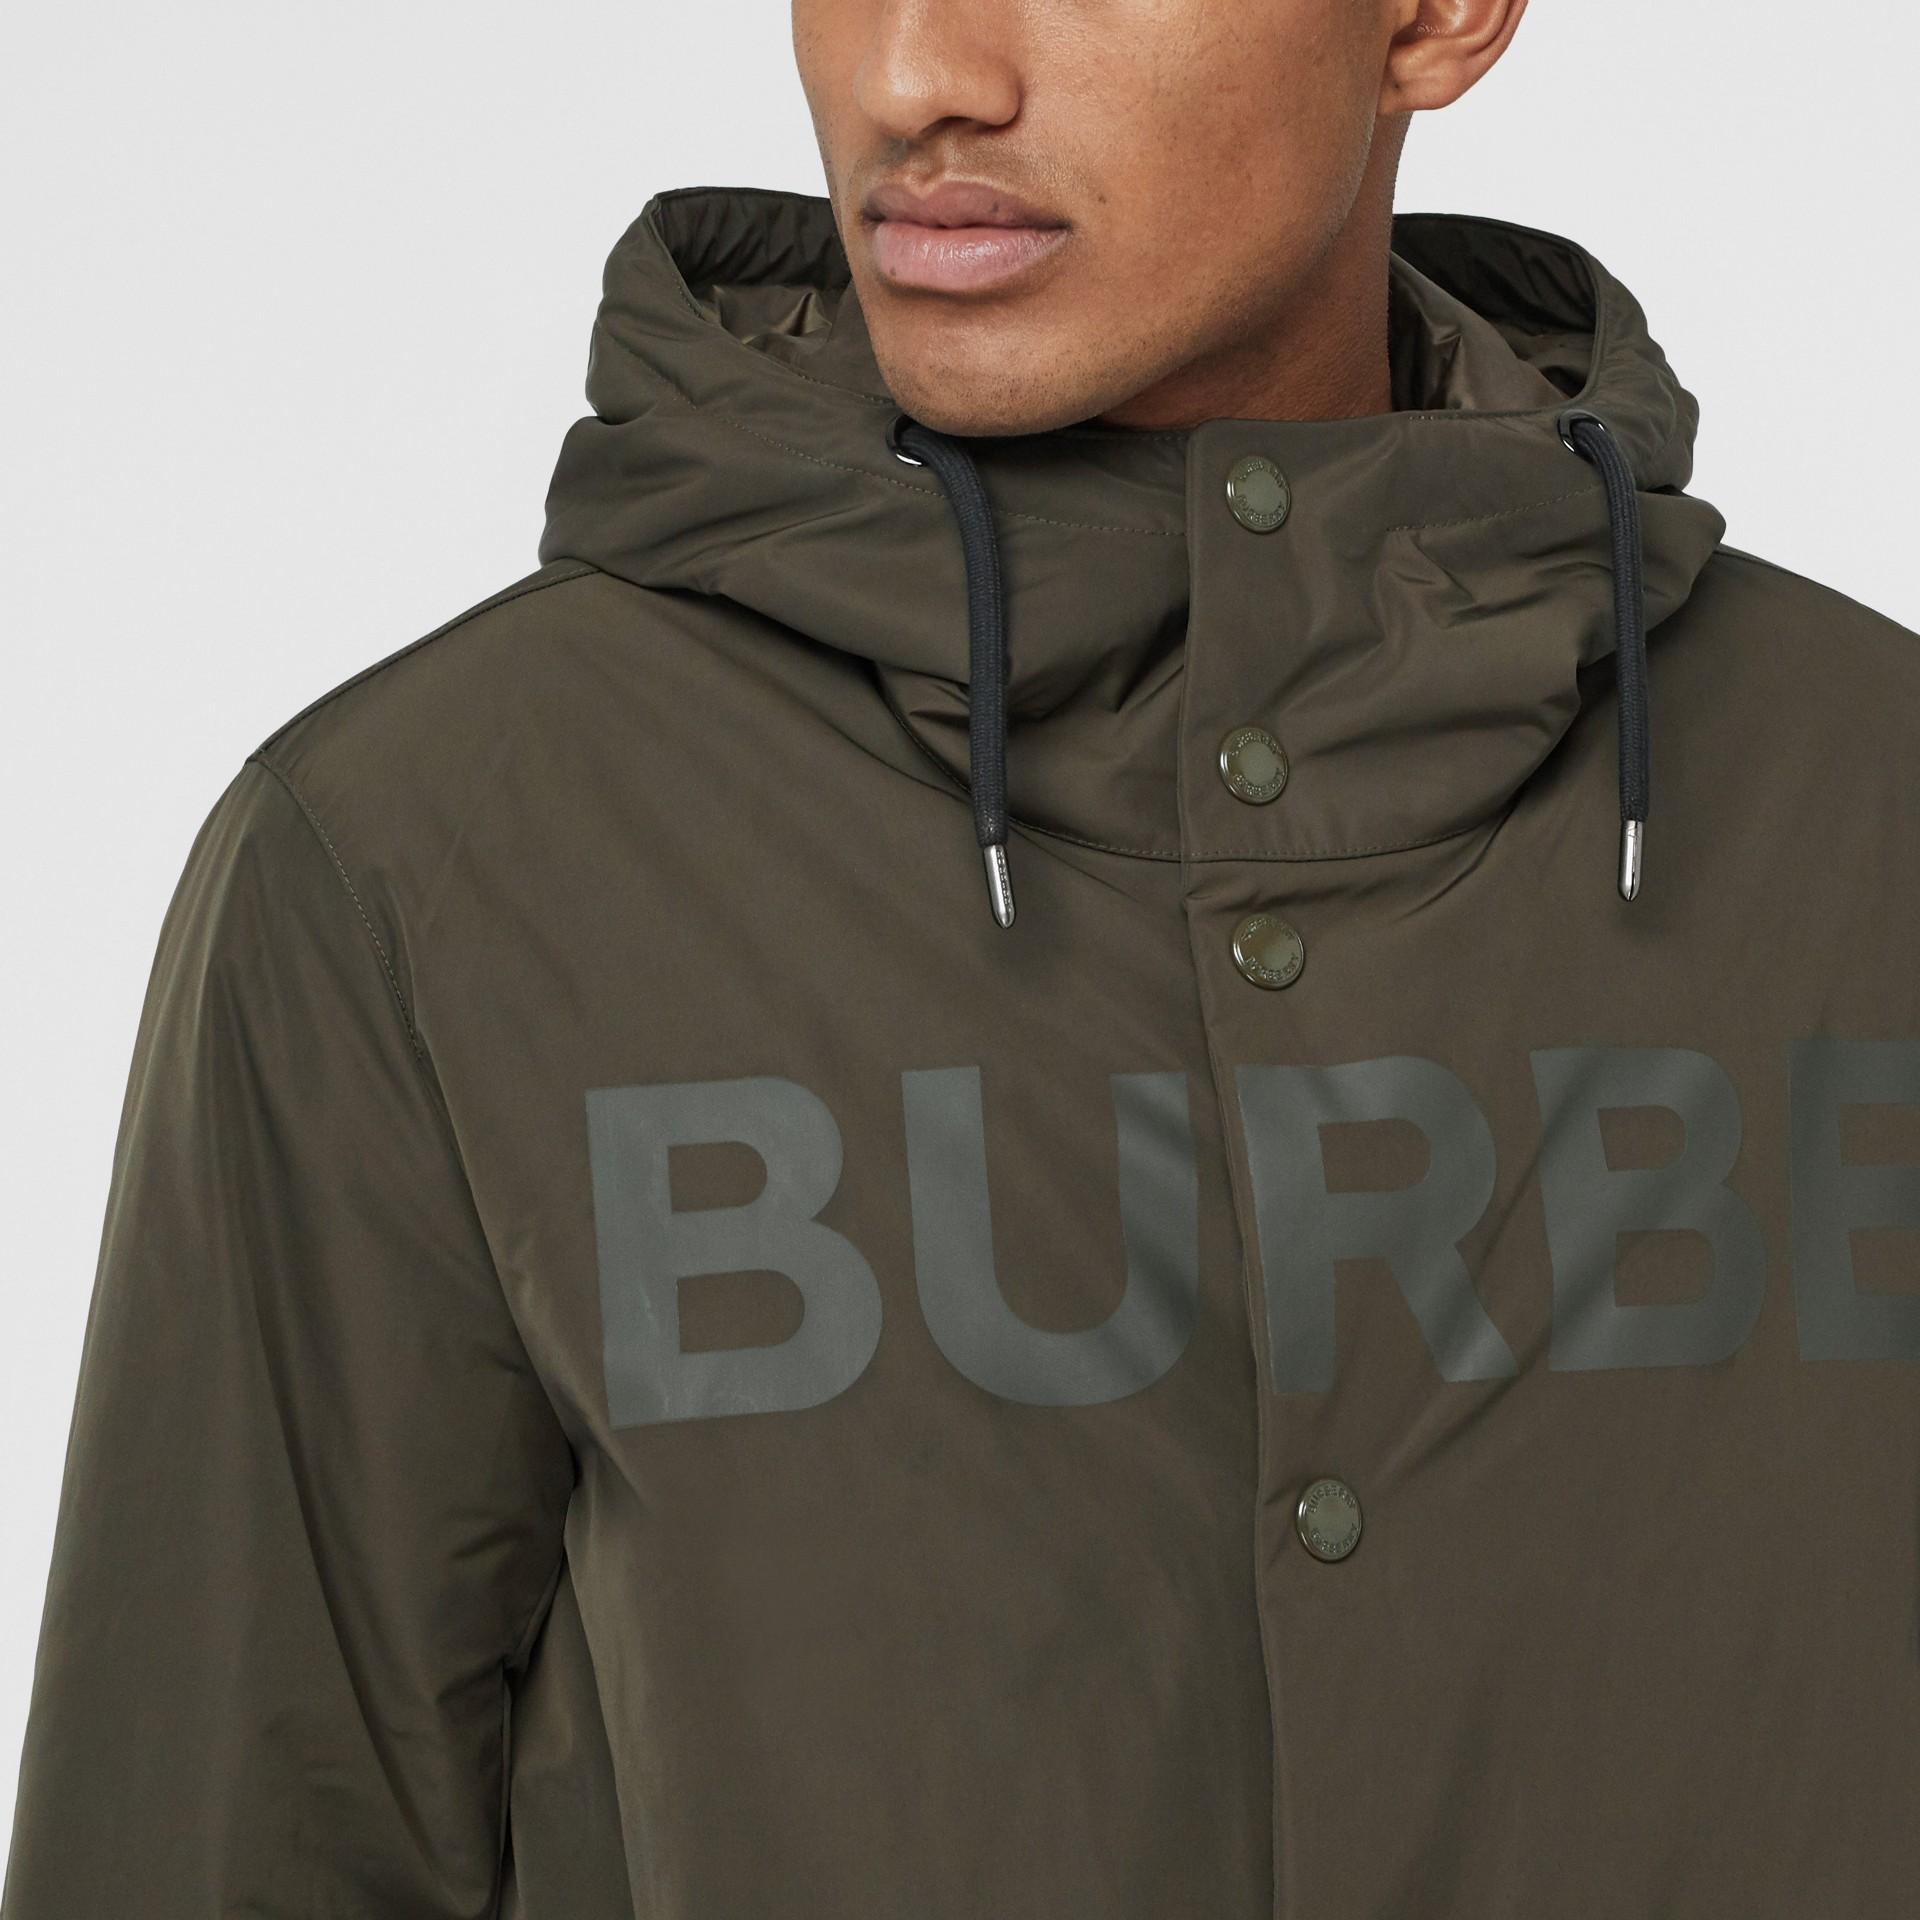 Horseferry Print Shape-memory Taffeta Hooded Coat in Khaki - Men | Burberry - gallery image 4